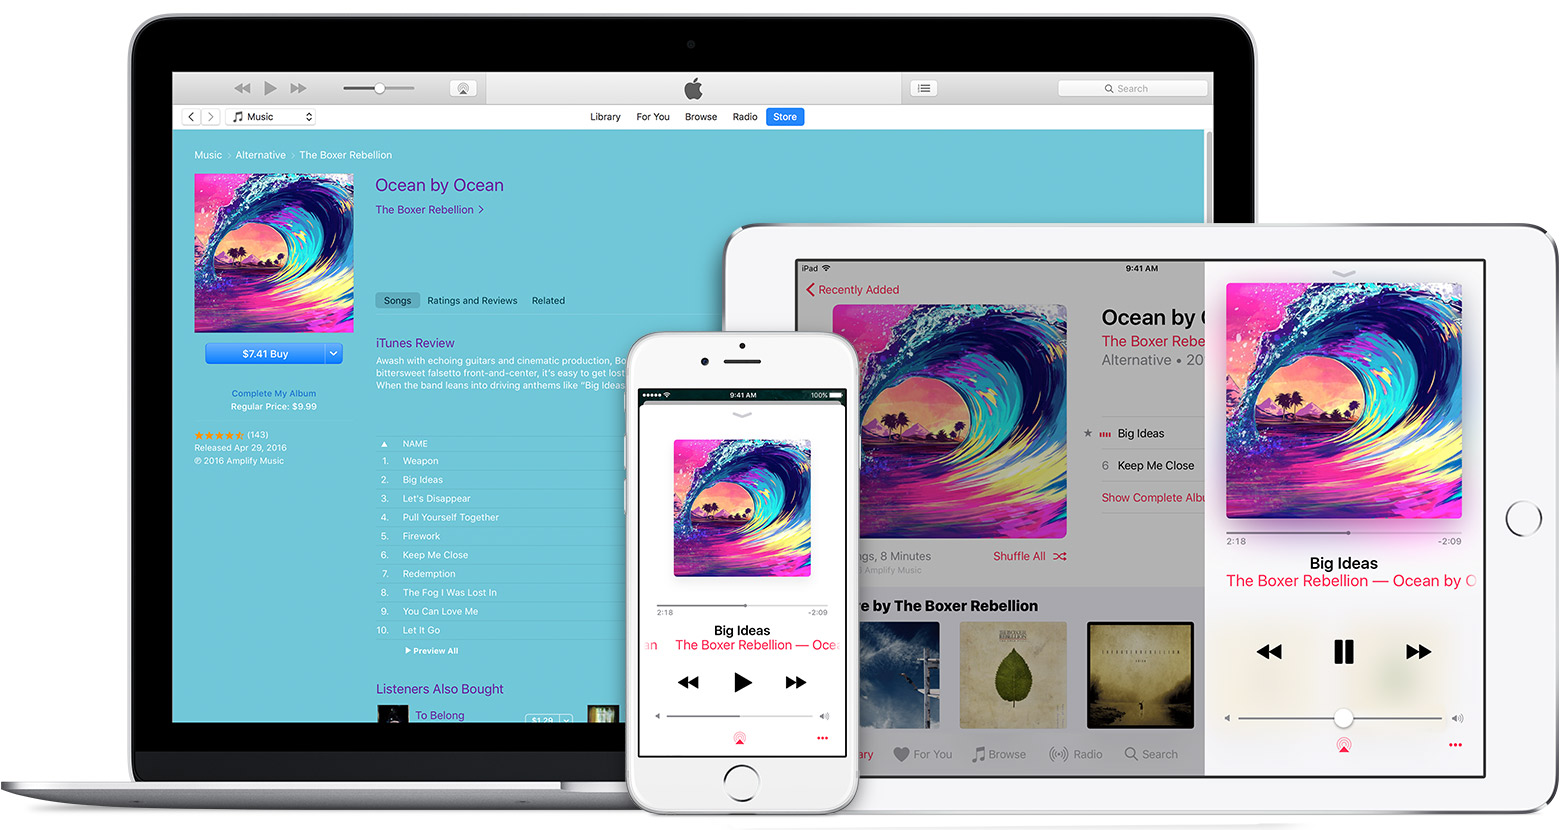 macos-itunes12-5-ios10-apple-music-student-membership-hero